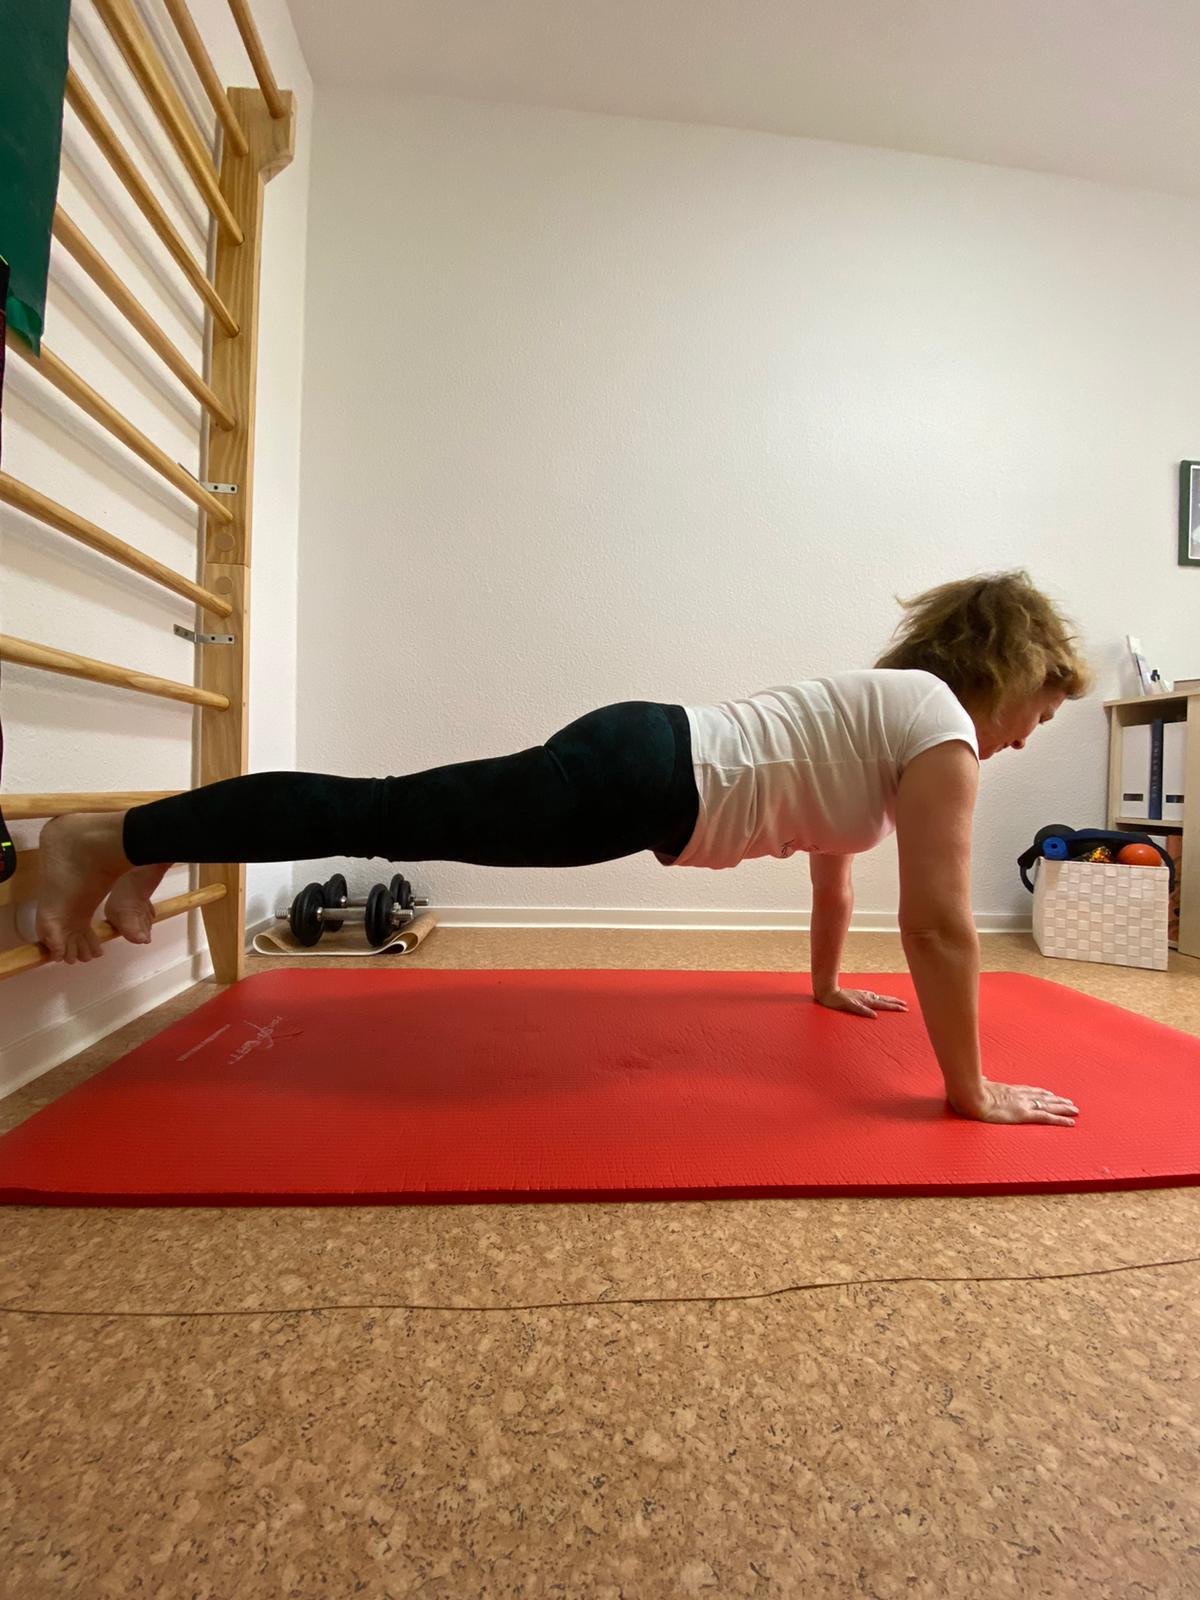 Planking mal anders